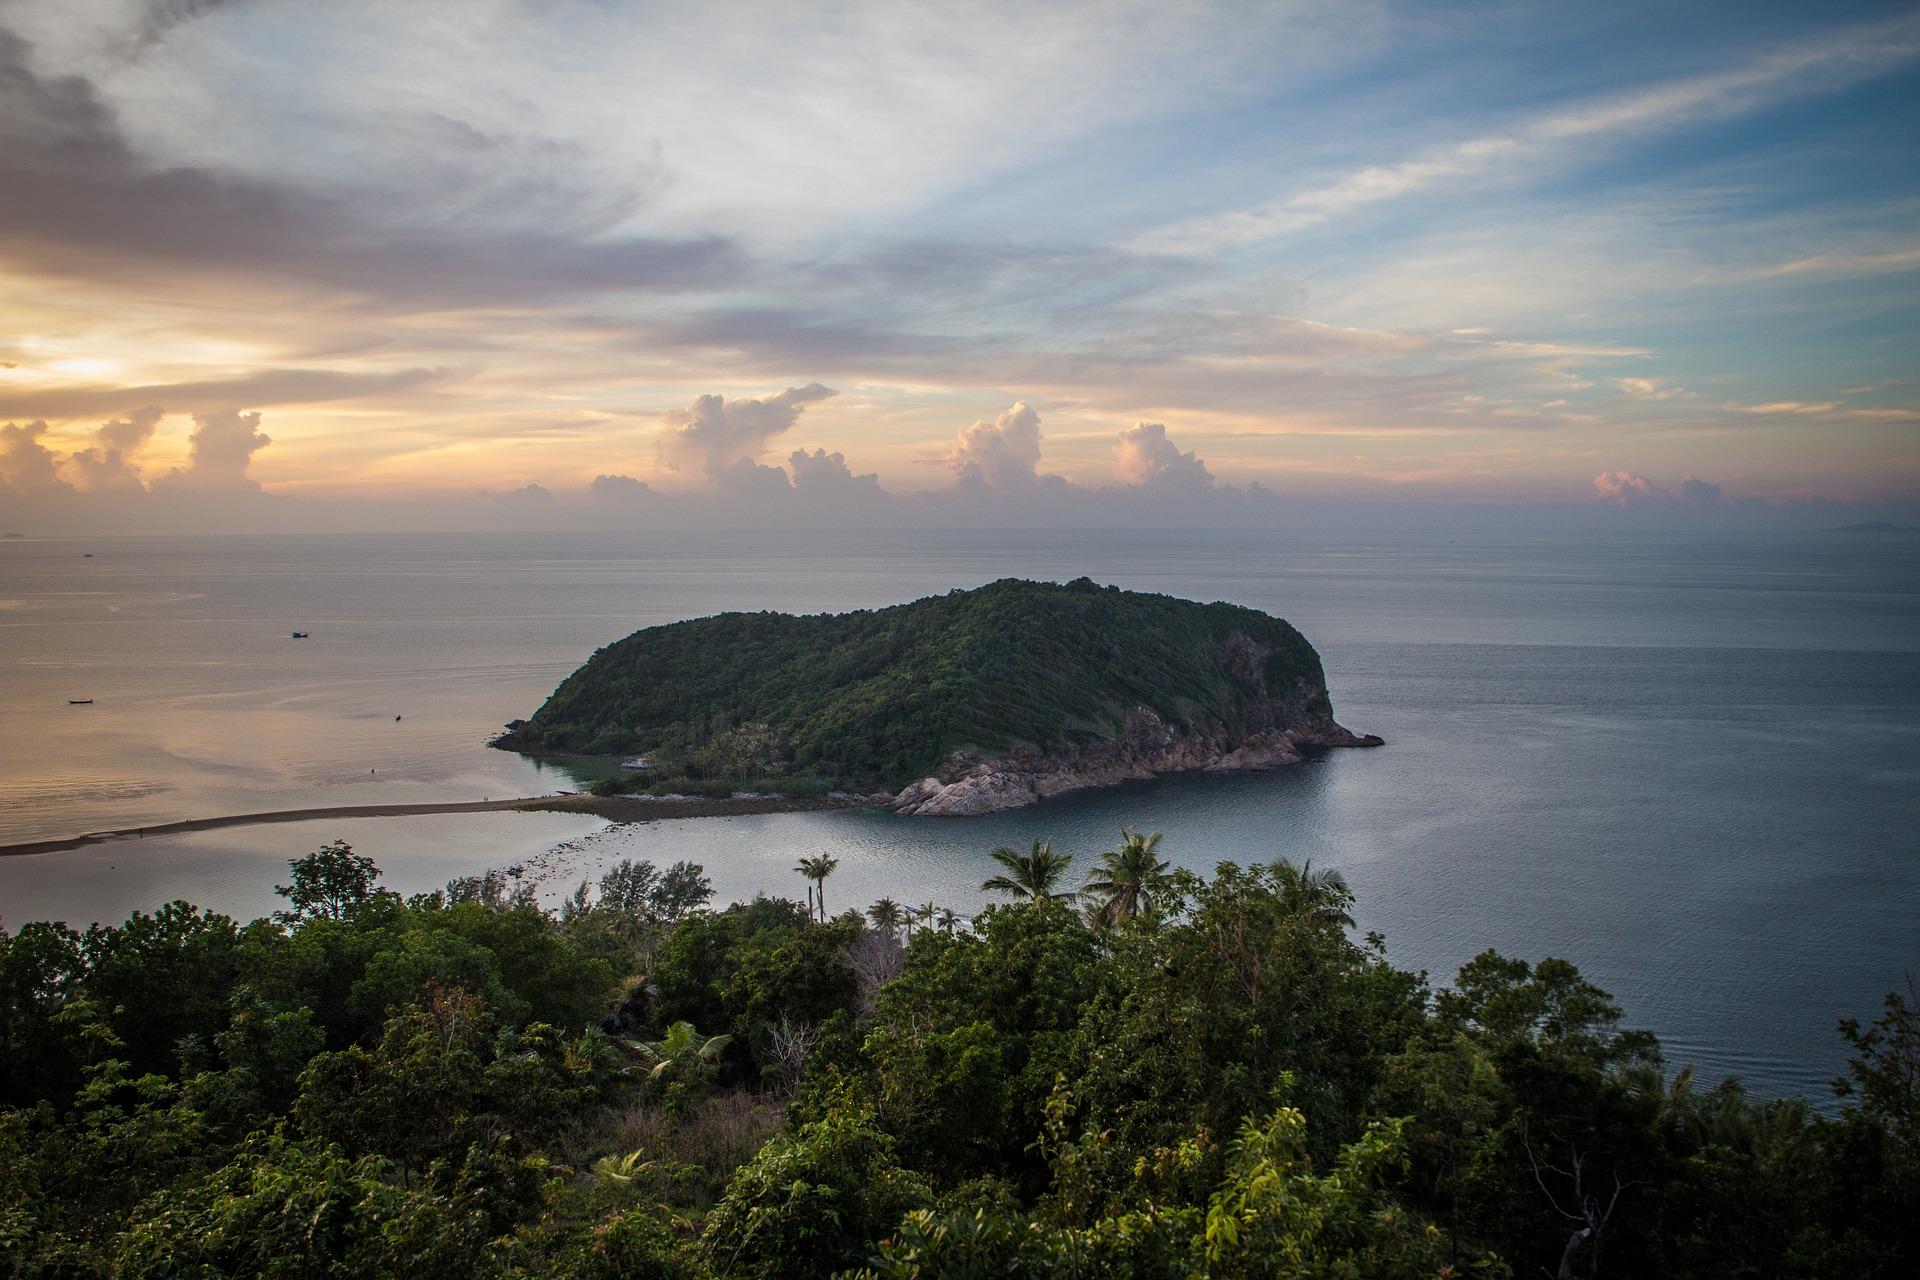 Koh Phangan | DigiNo | 10 Best Locations For Digital Nomads